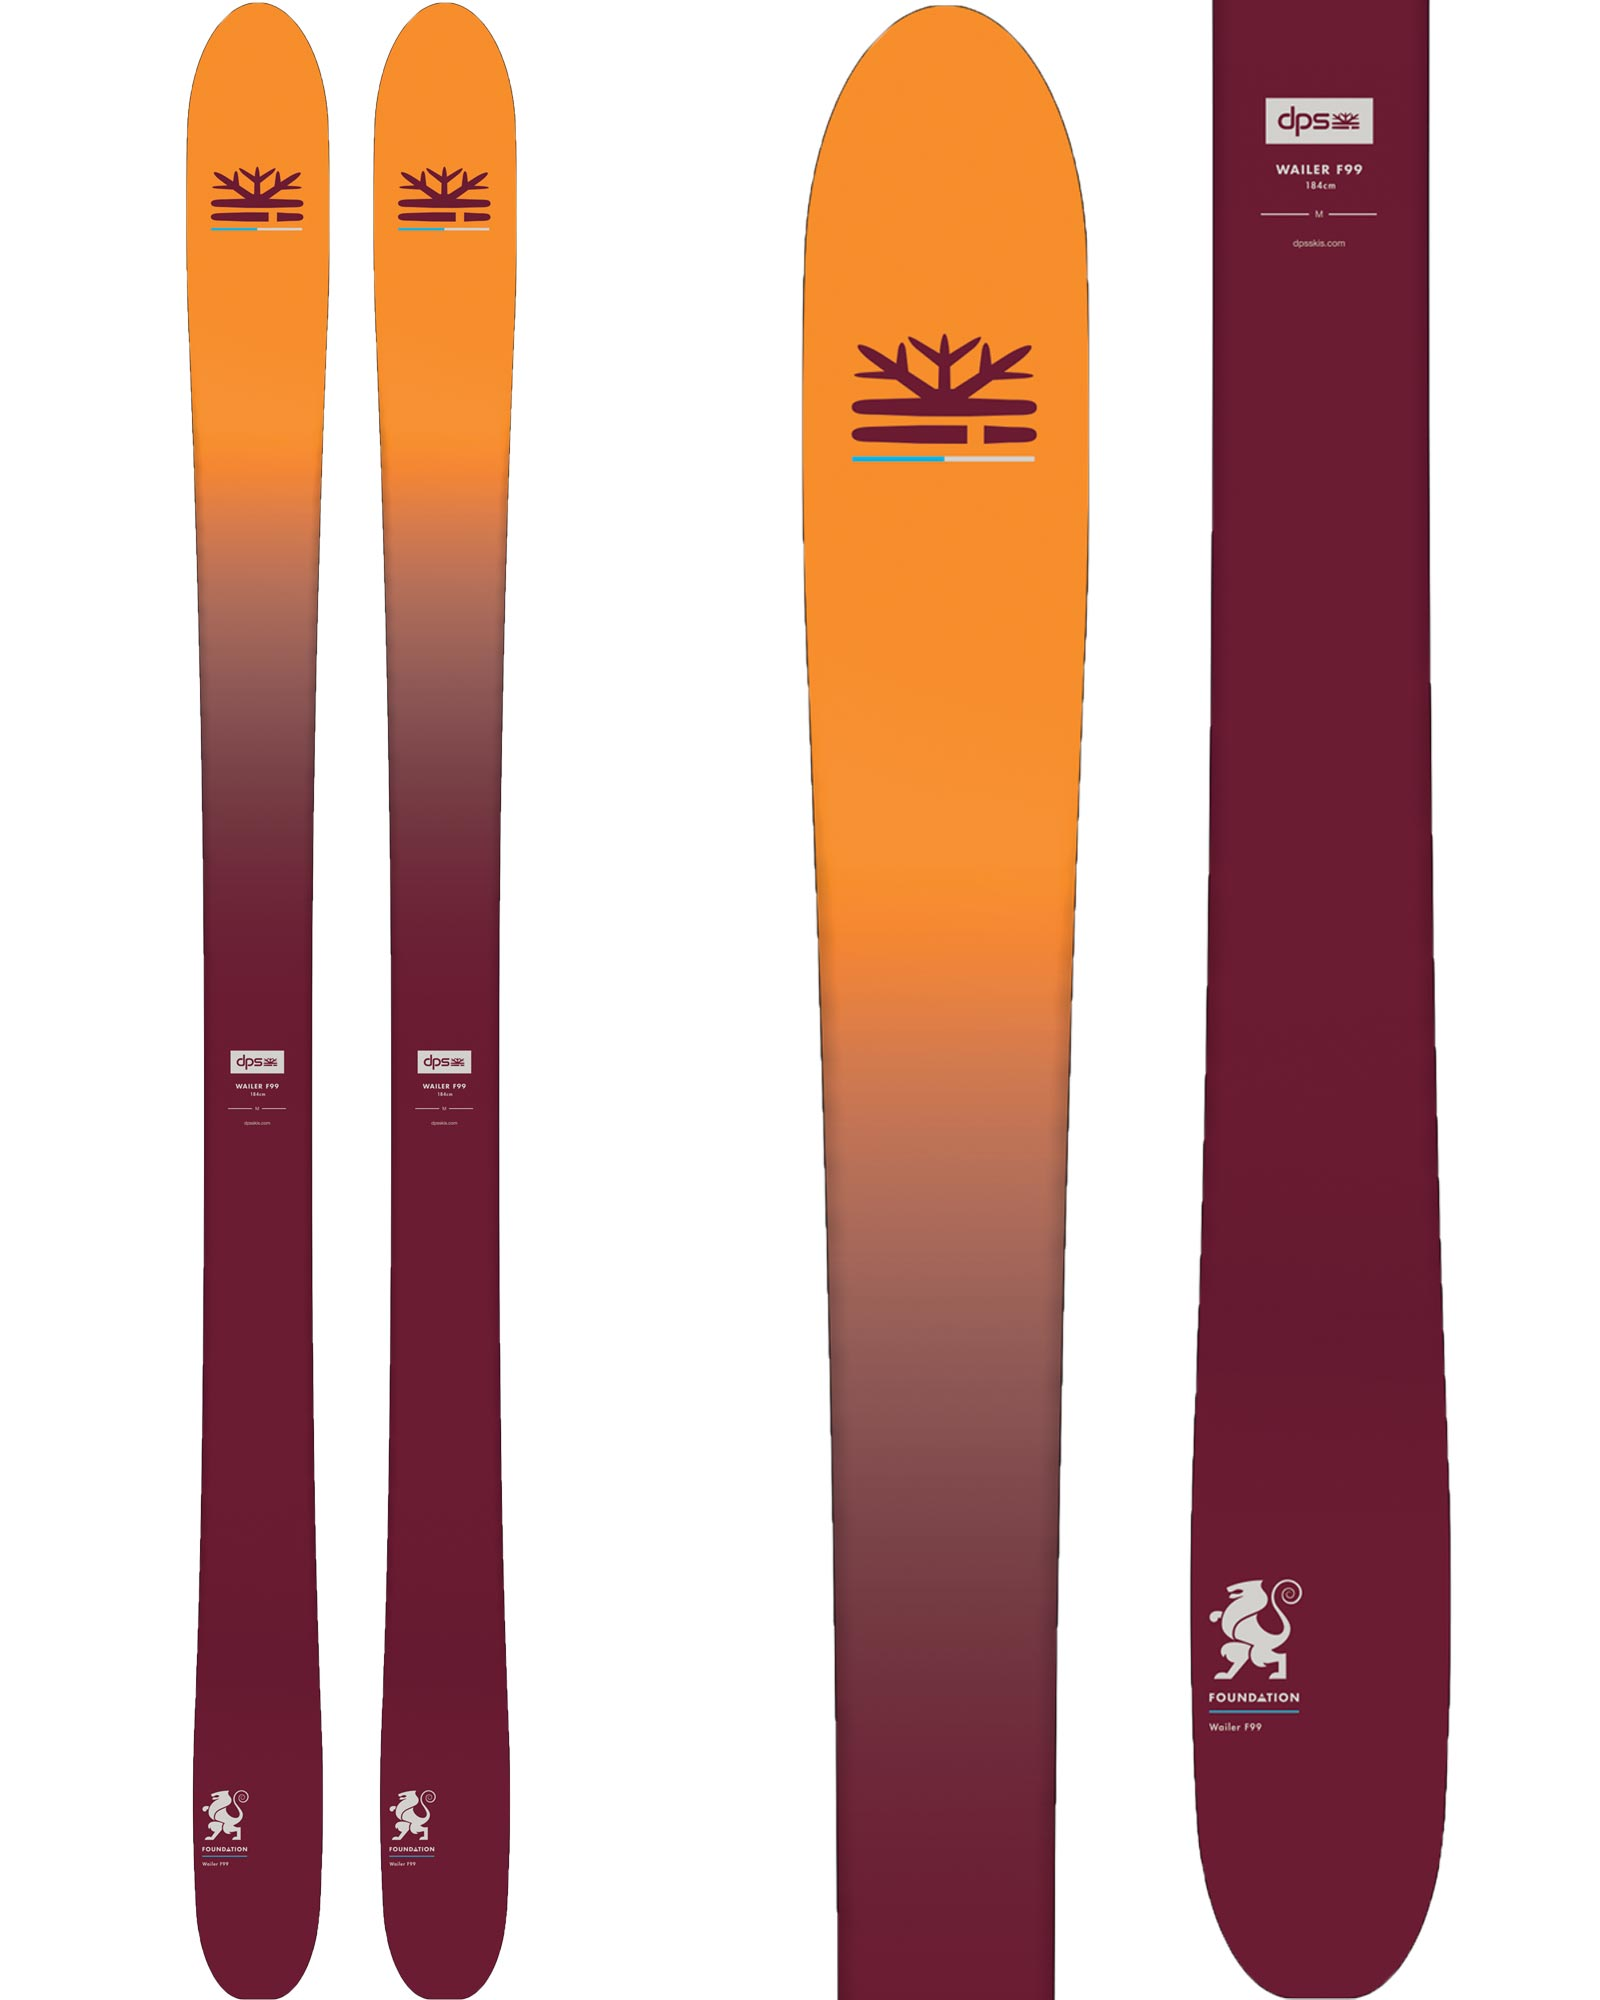 DPS Men's Wailer F99 All Mountain Skis 2018 / 2019 0